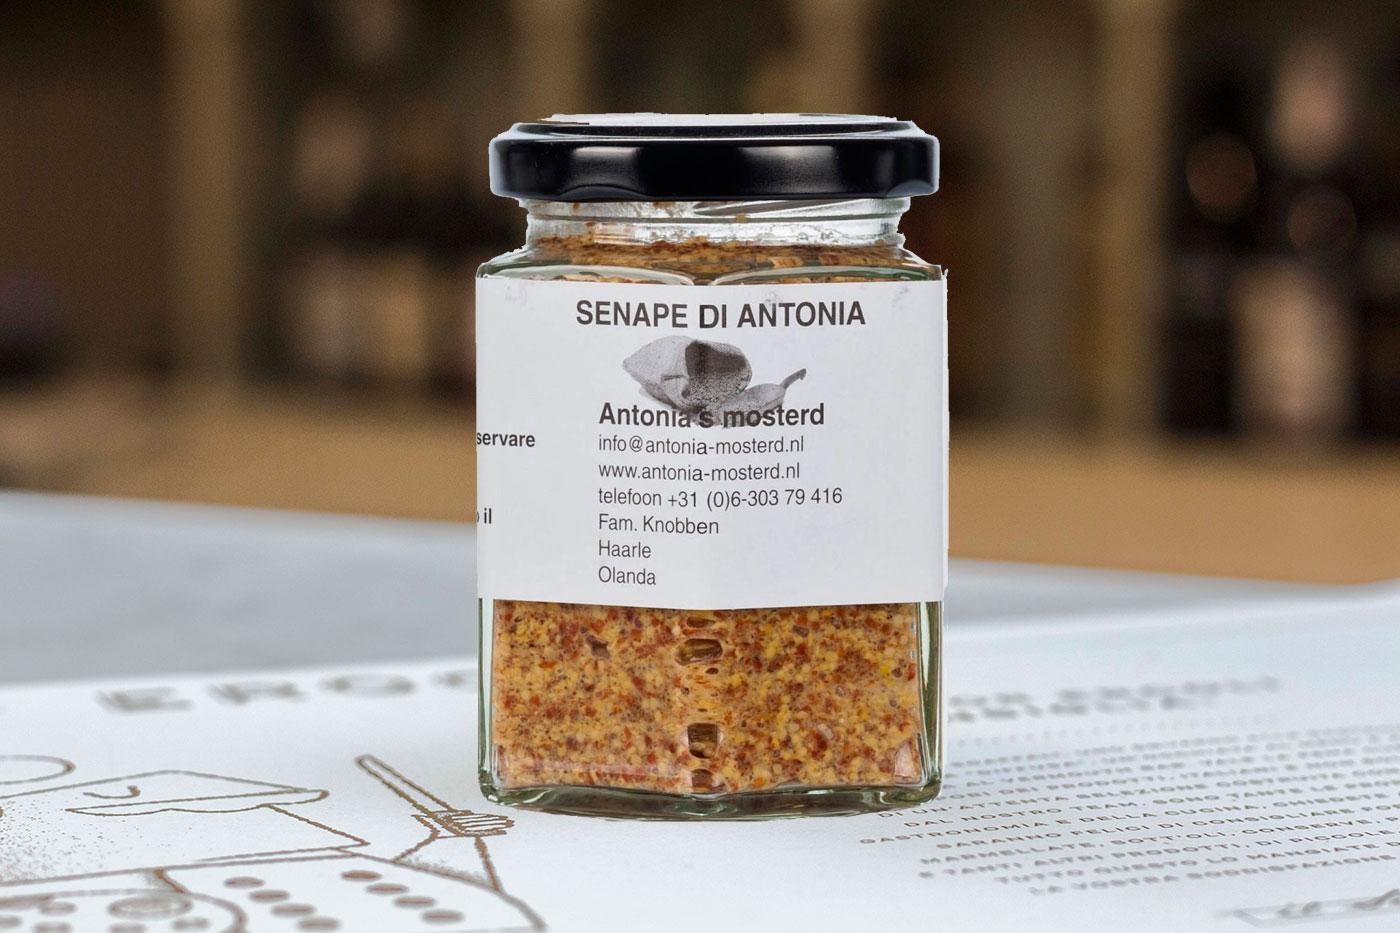 vasetto di senape Antonia's mosterd